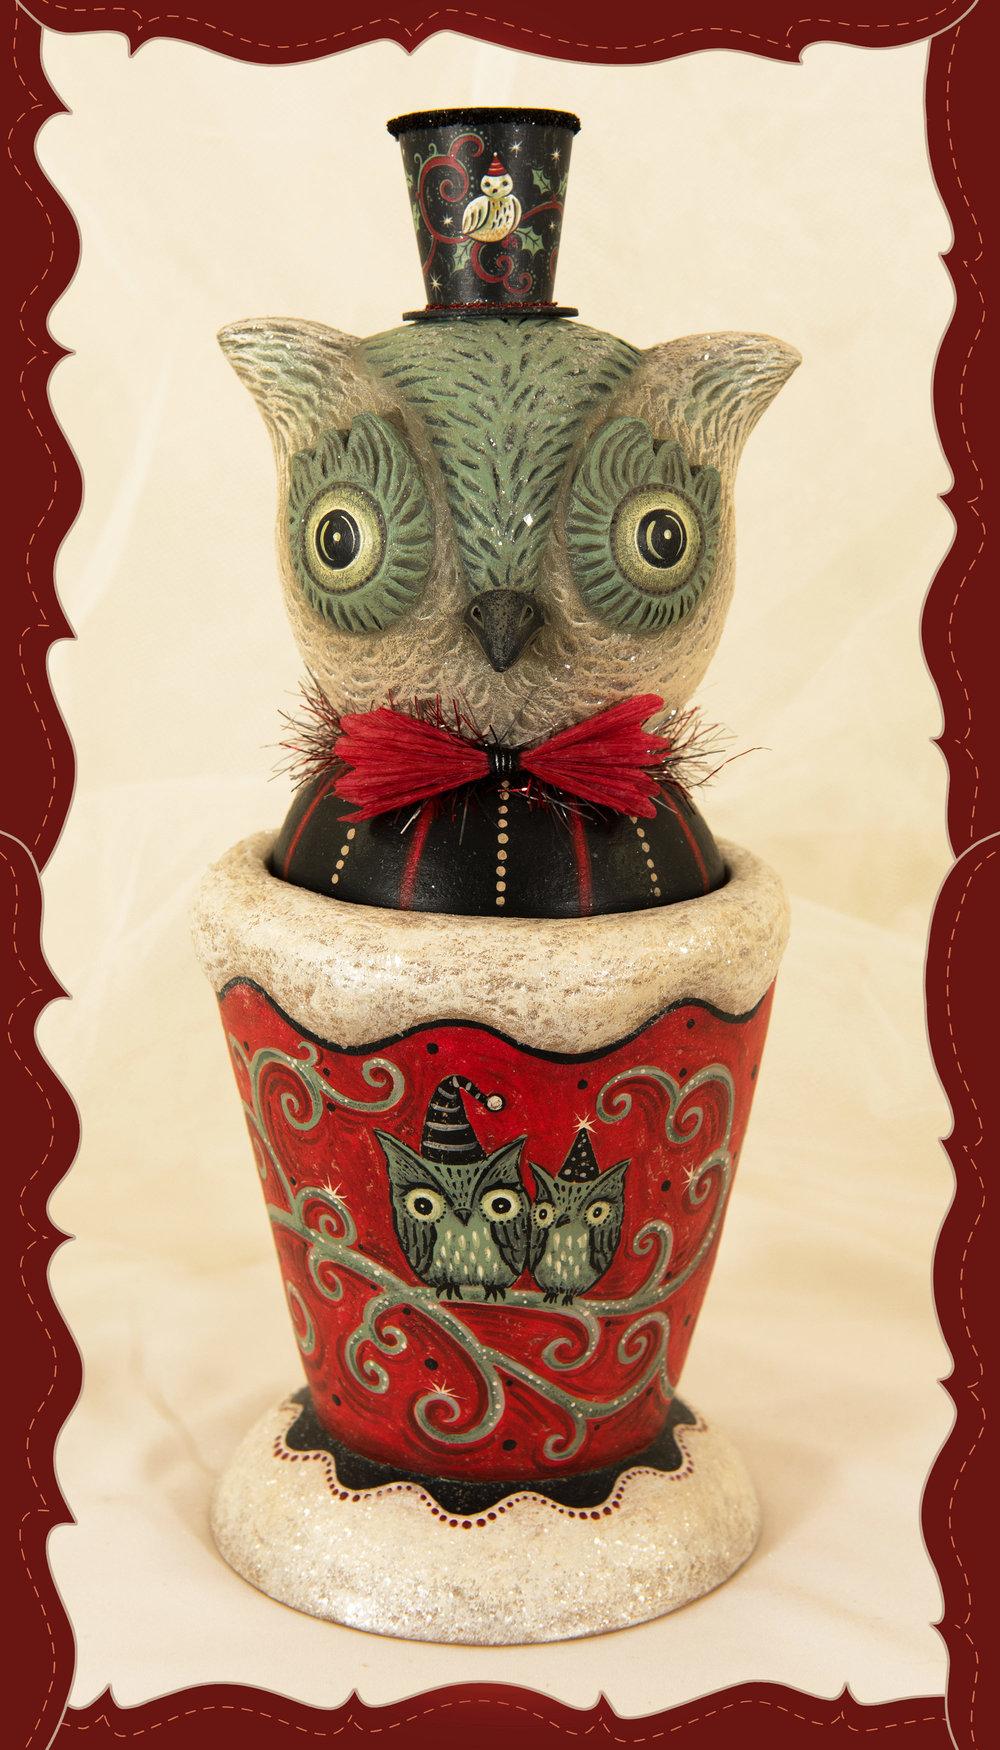 Johanna-Parker-Arthur-Owl-Merriwinter-Frame.jpg